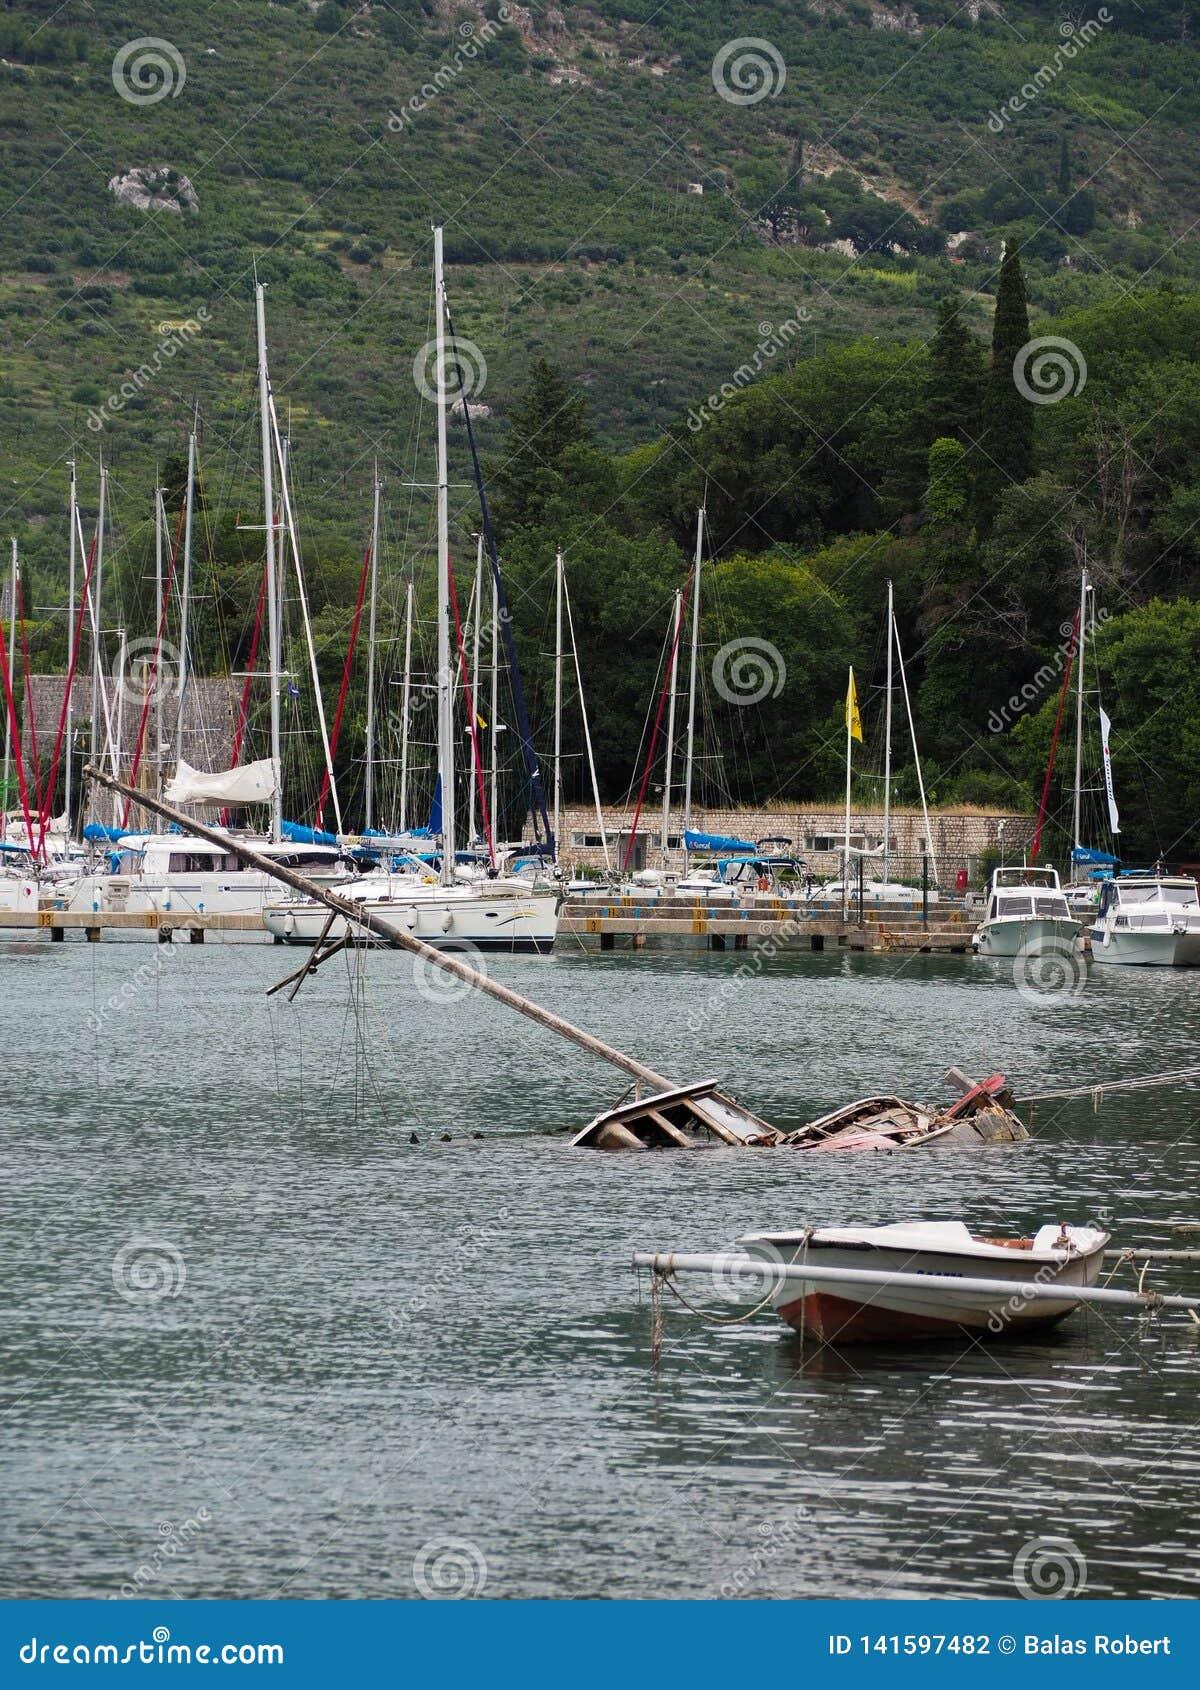 Sunk destroyed boat in harbor